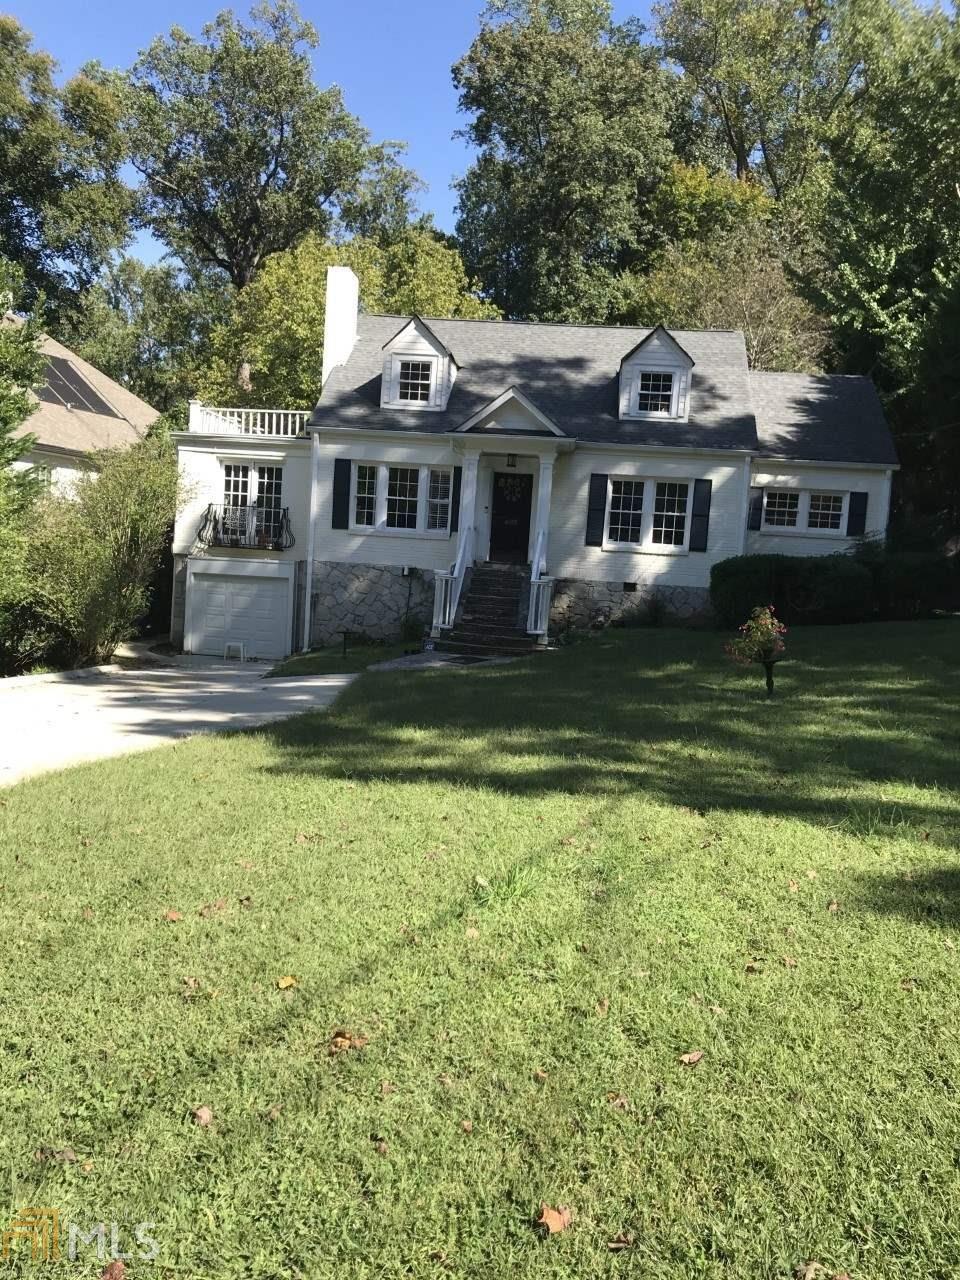 4055 N Ivy Rd, Atlanta, GA 30342 - MLS#: 8879626